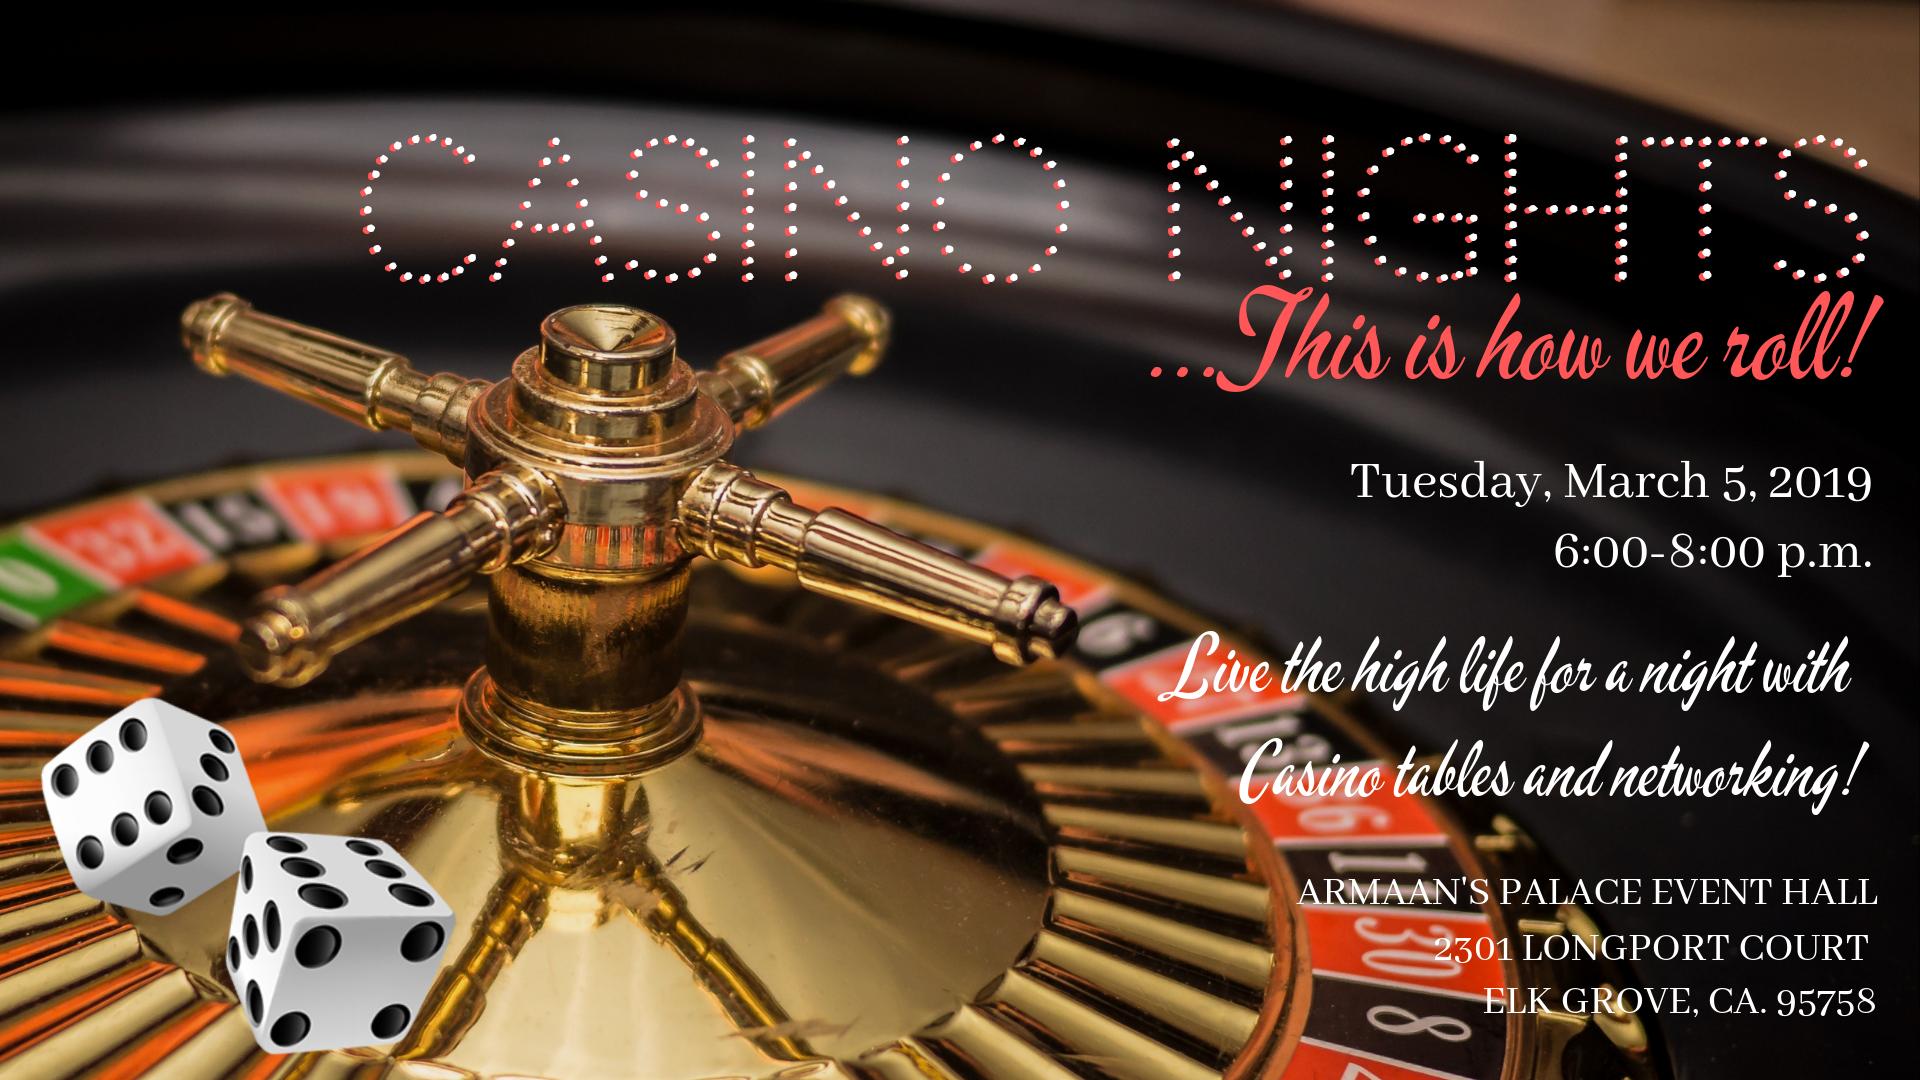 Casino Nights wedding professional networking mixer